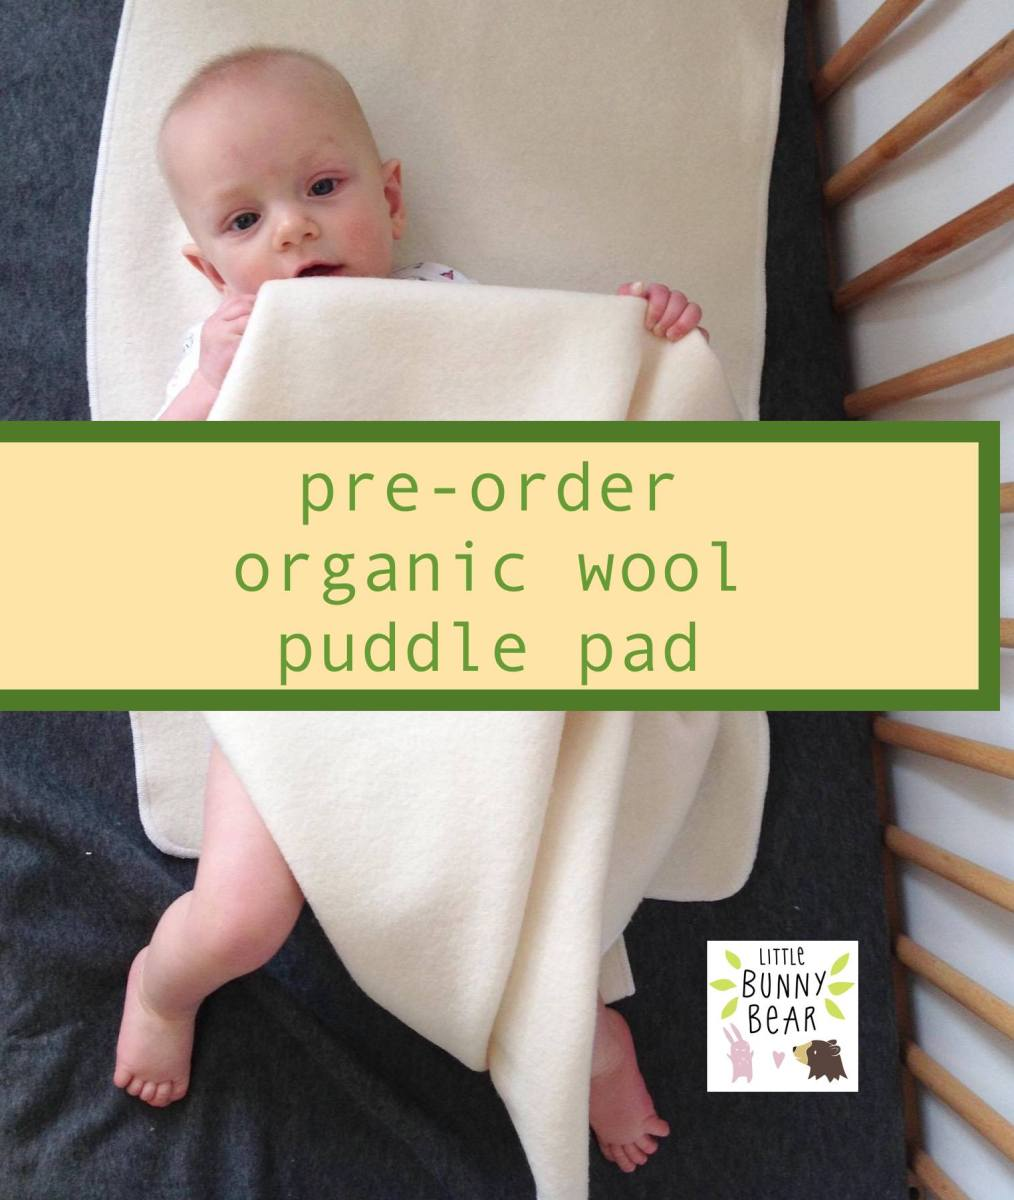 Organic wool baby mattress protector puddle pad